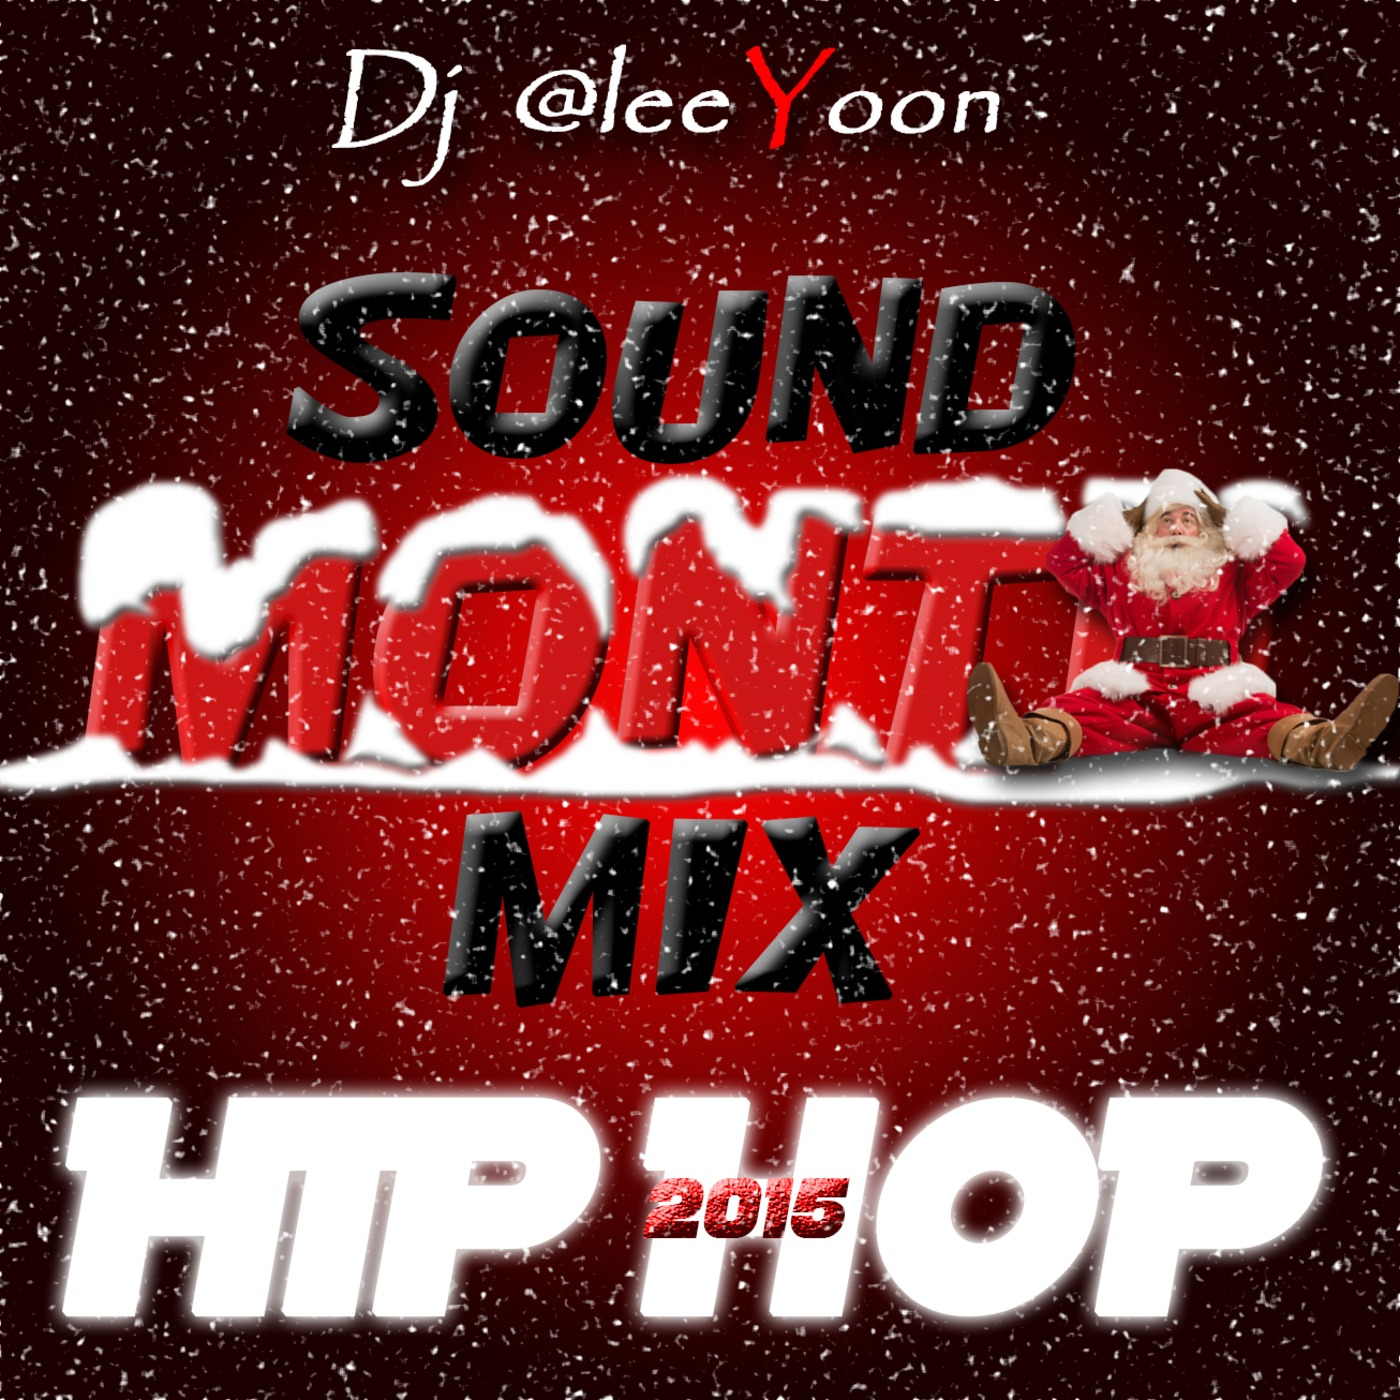 SOUND MONTH MIX BEST OF HIP HOP 2015 Dj @leeYoon podcast